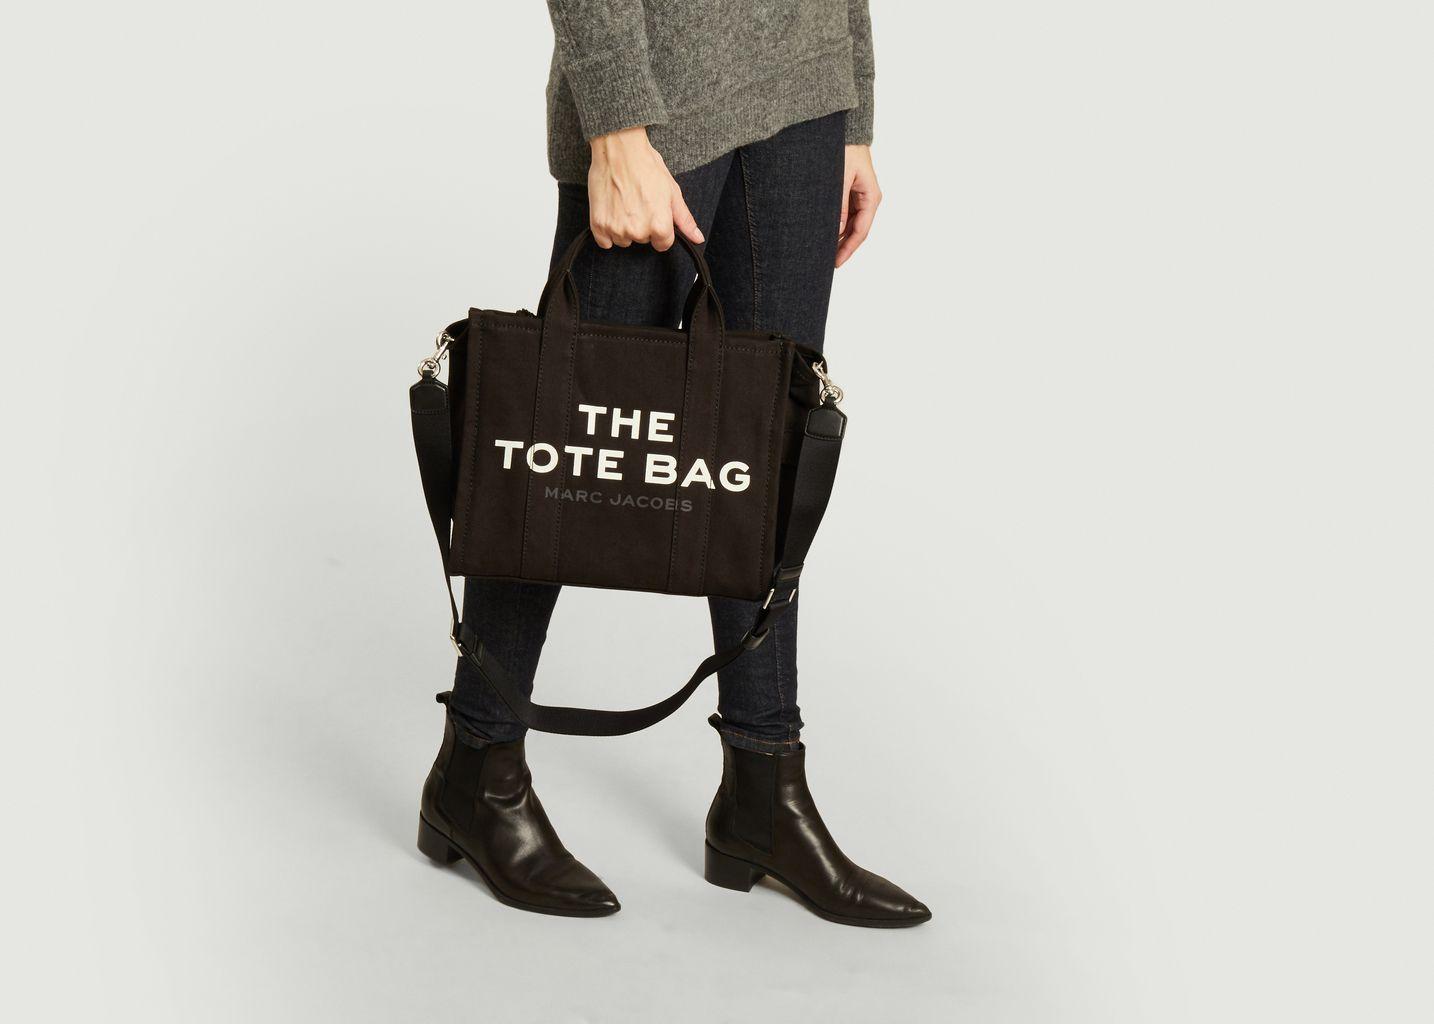 Sac cabas en coton The Traveler Tote Small - Marc Jacobs (THE)